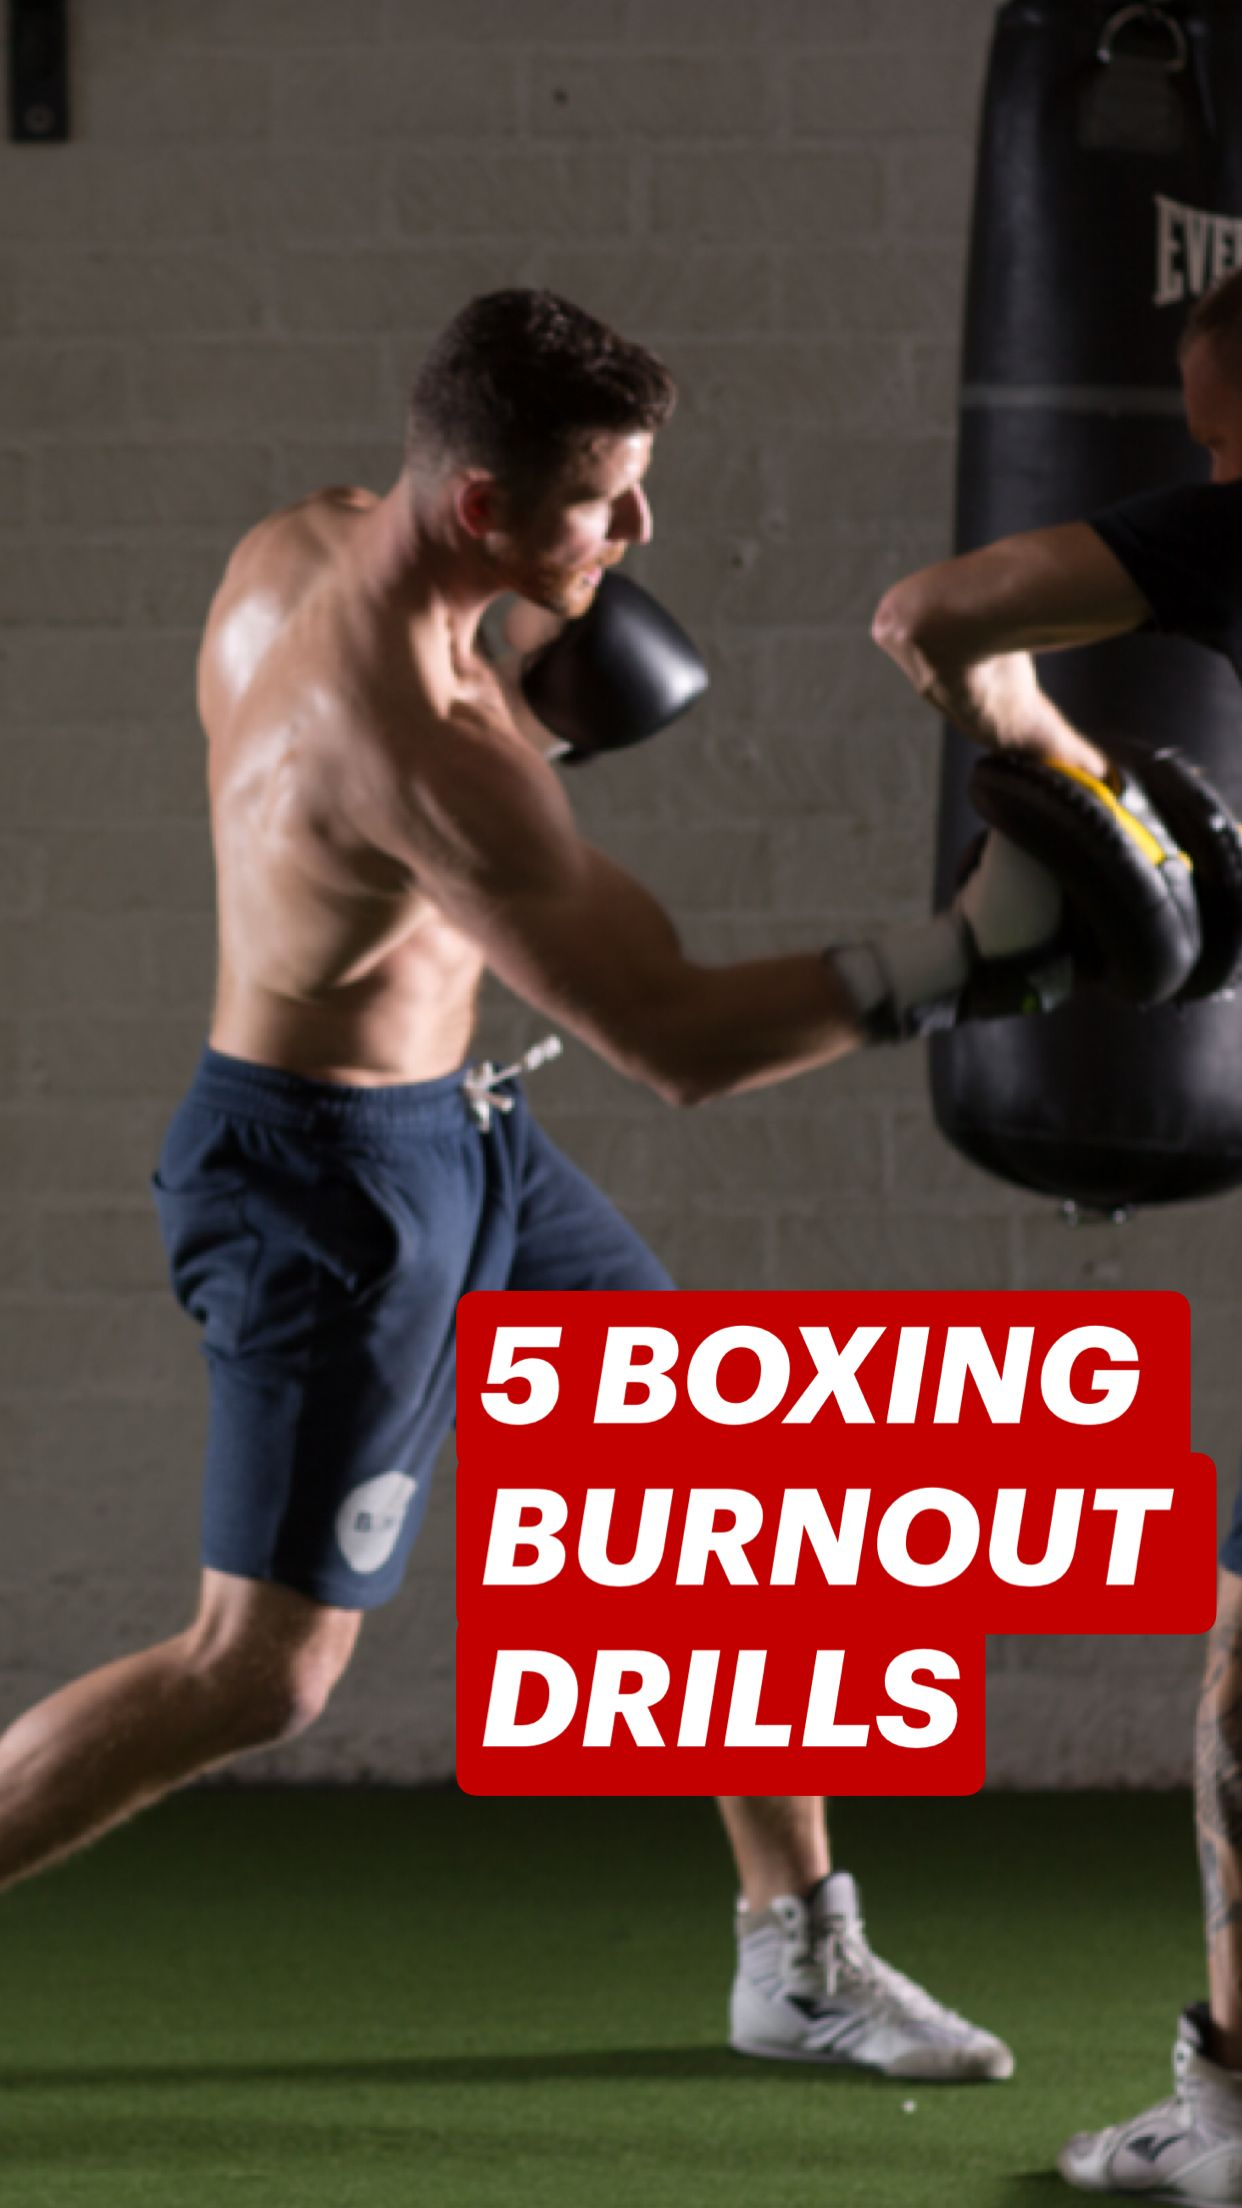 5 BOXING BURNOUT DRILLS